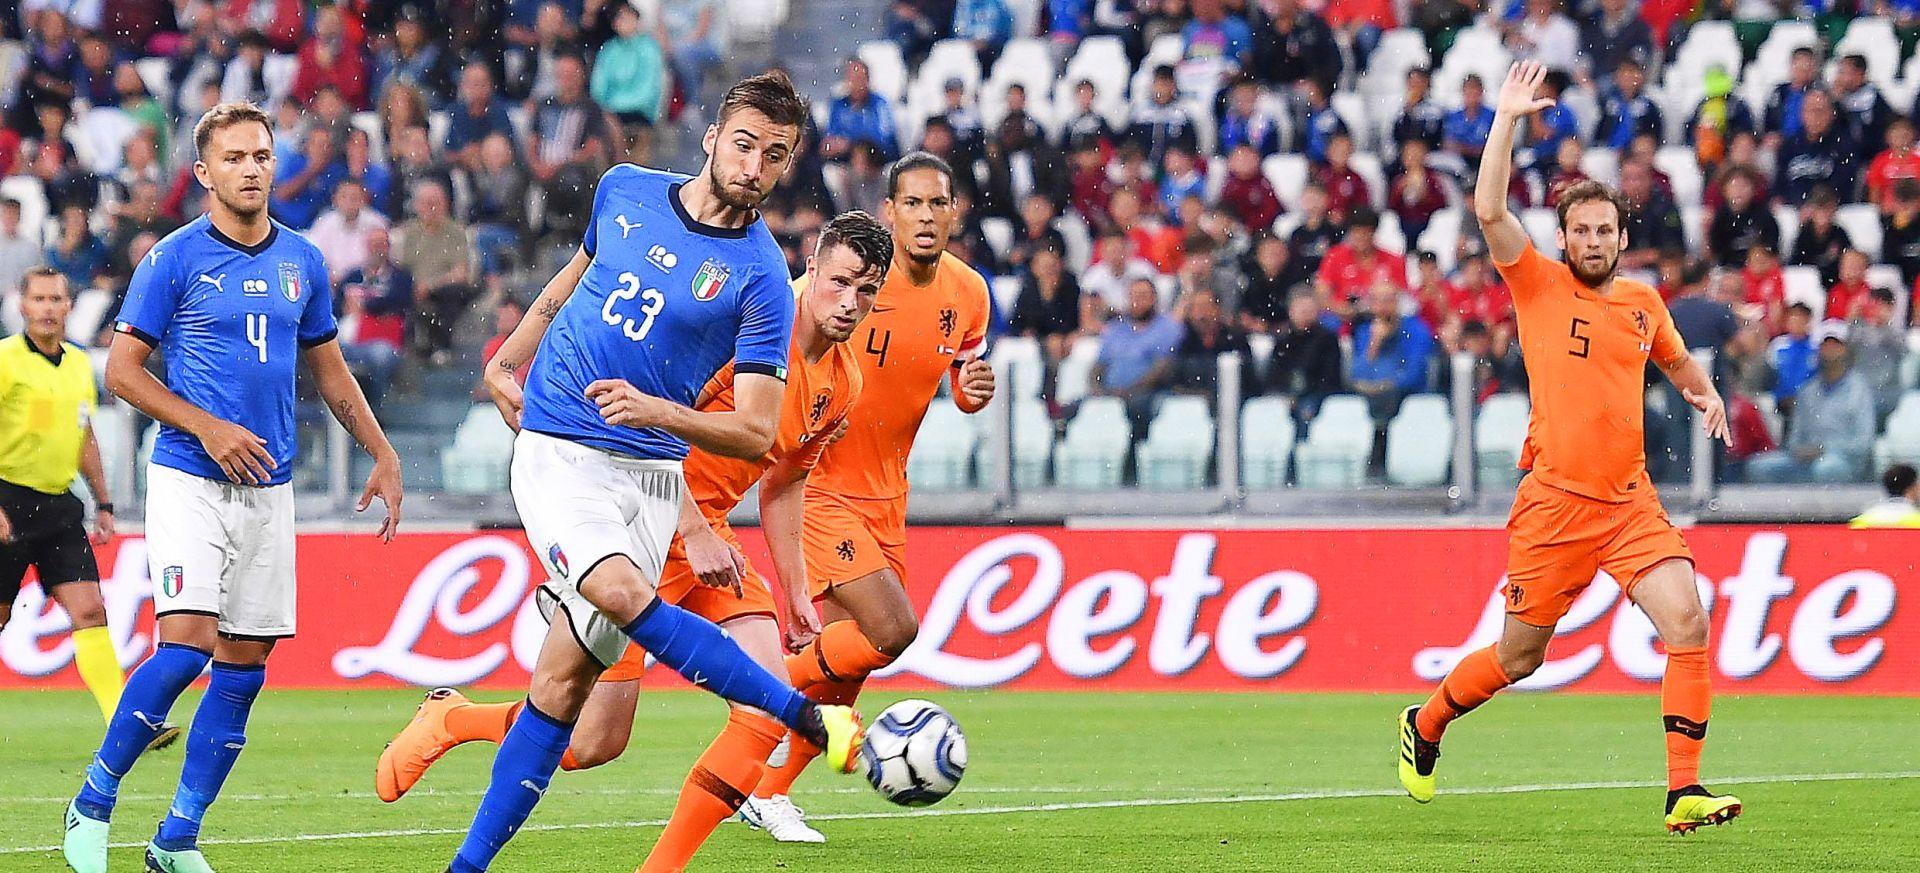 PRIJATELJSKE UTAKMICE Poraz Srbije, remi Italije i Nizozemske